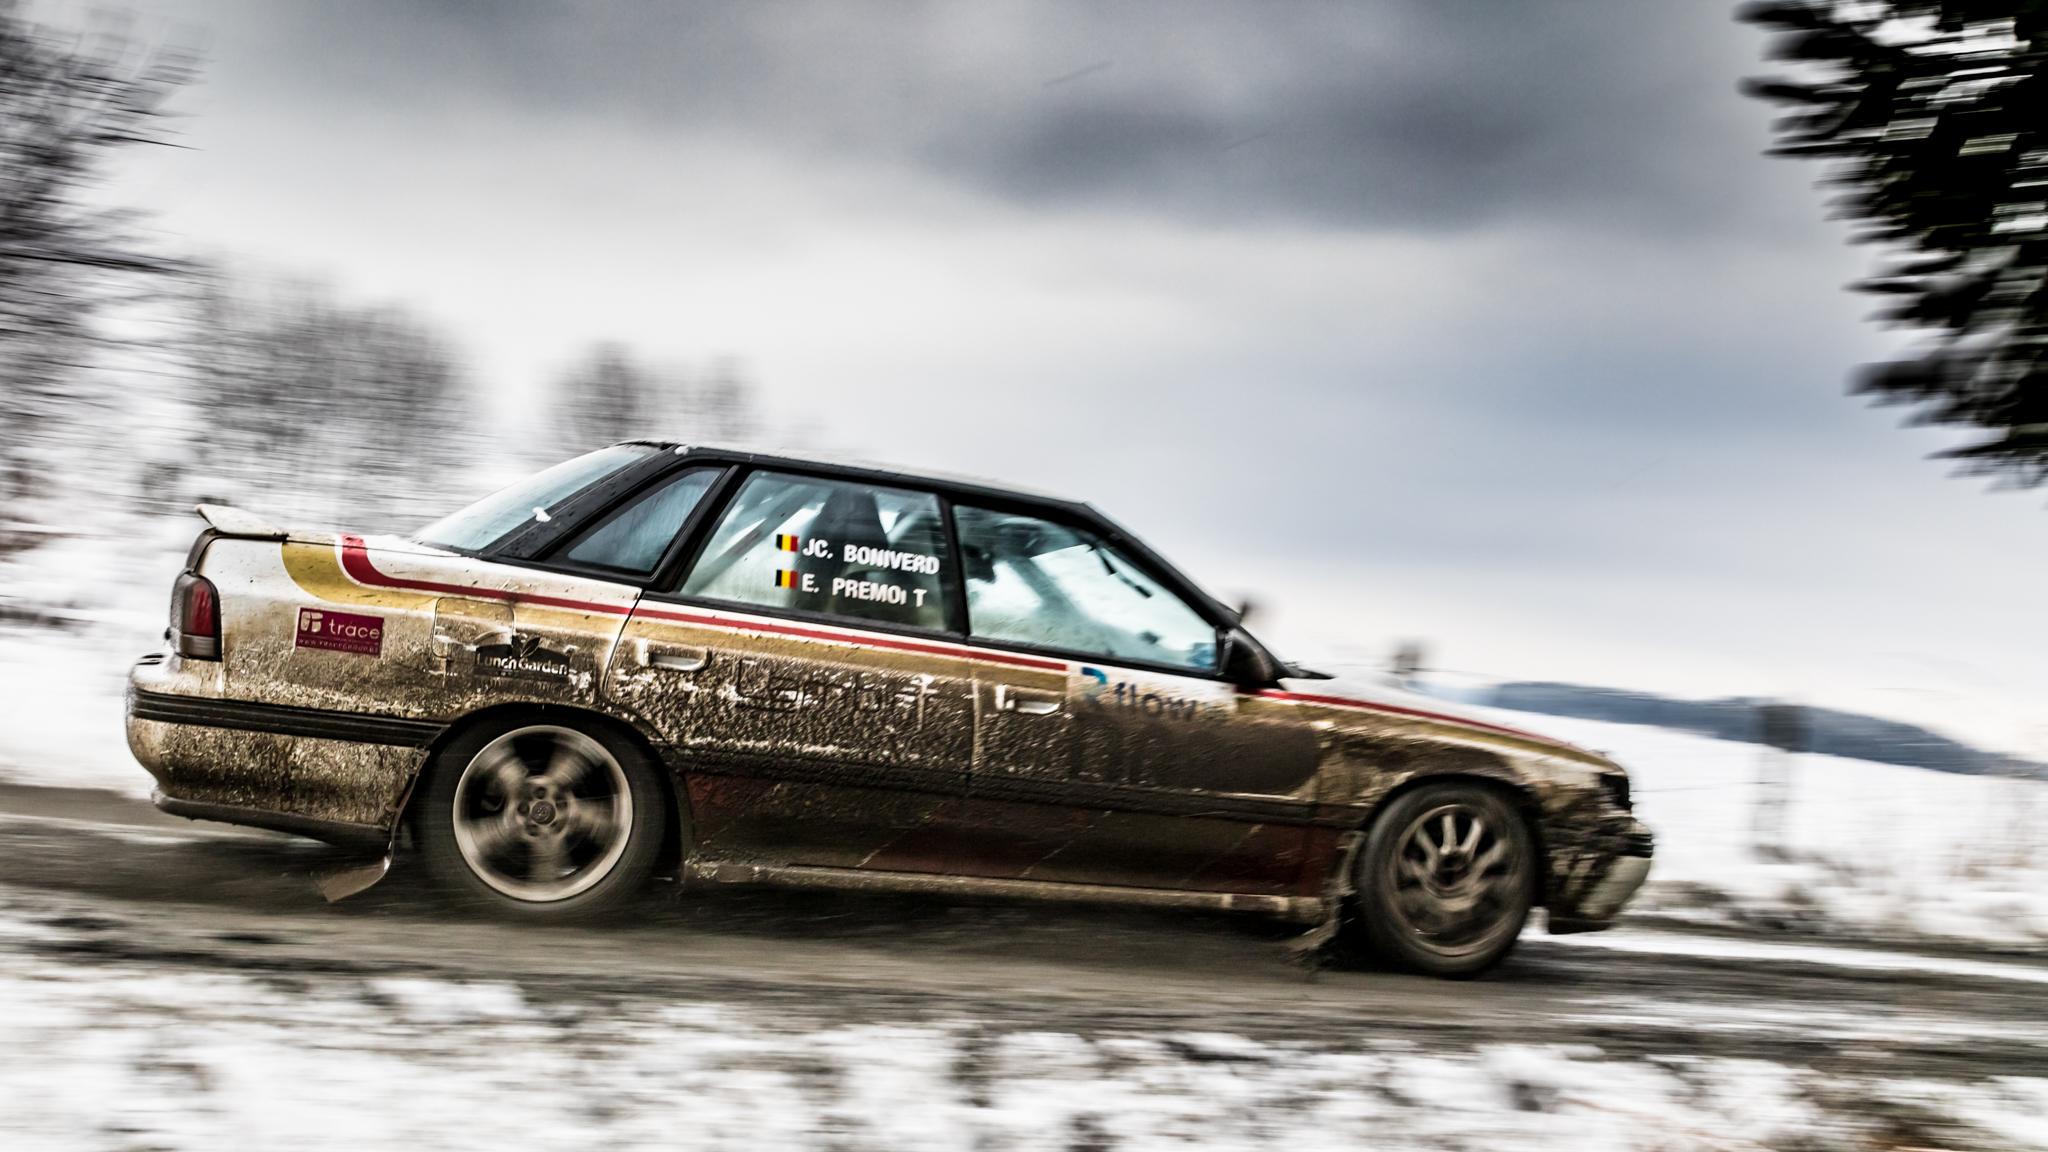 Emile Premont and Jean-Claude Boniverd in Subaru Legacy 4WD Turbo